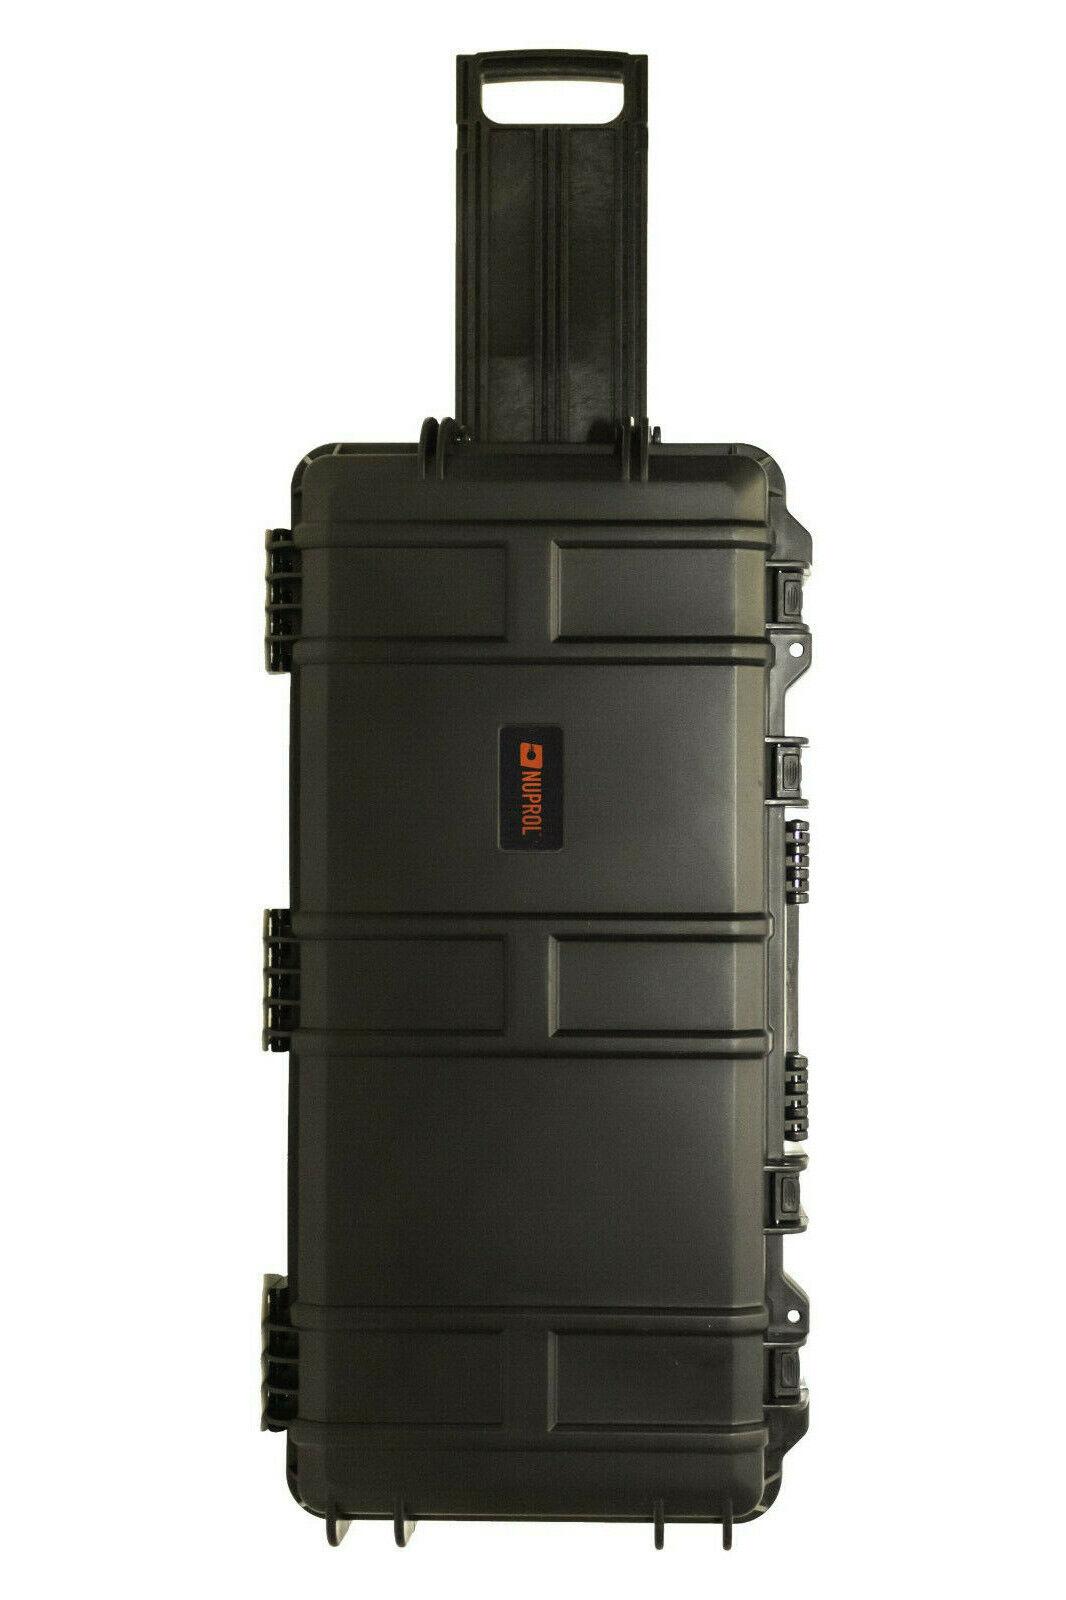 Nuprol SMG Takedown Rifle Egg Foam Padded ABS Hard Case IP67 80 x 39cm